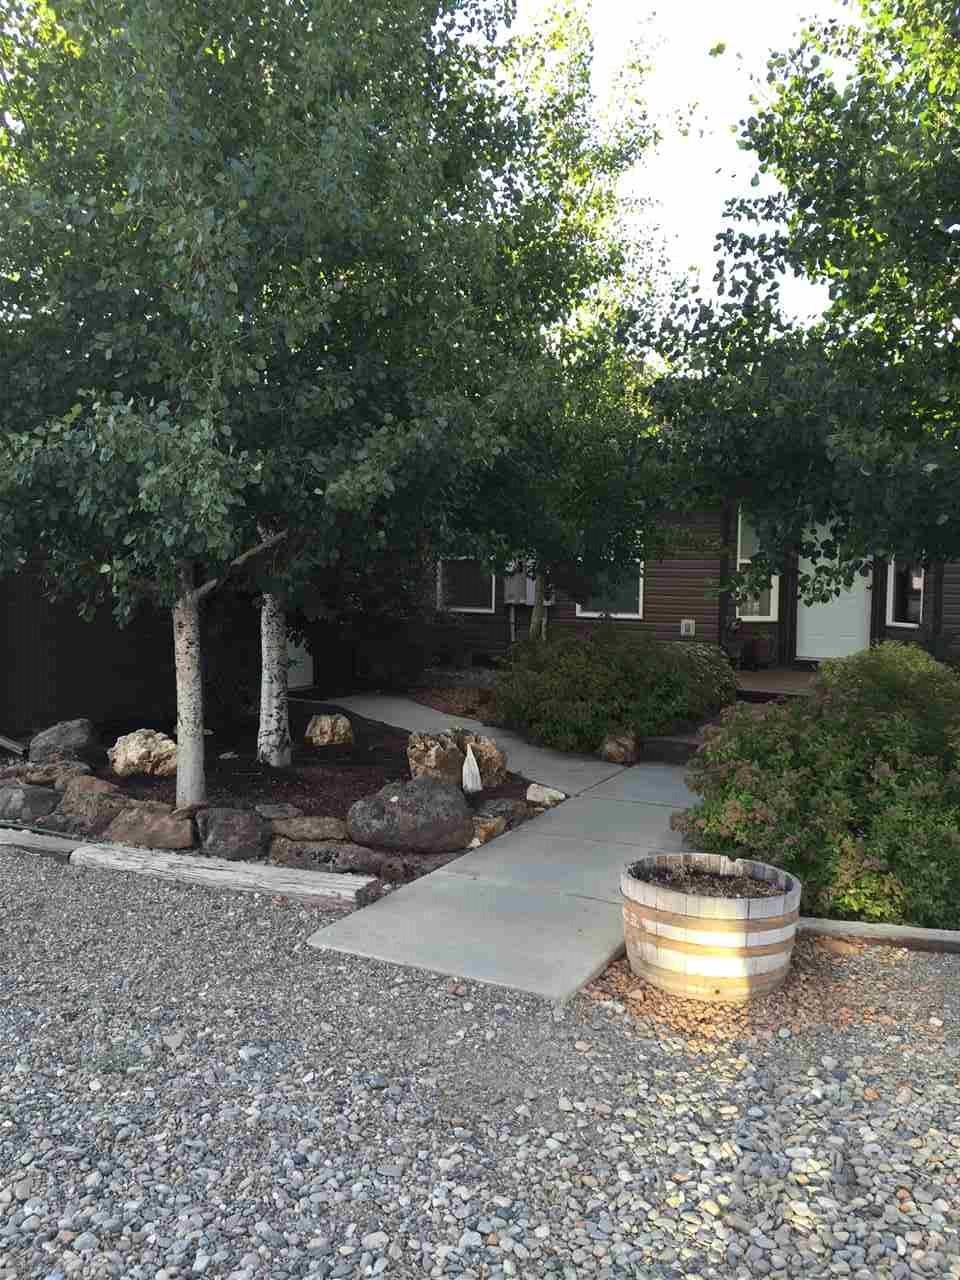 农场 为 销售 在 222 N CAMP CREEK Road 222 N CAMP CREEK Road 费尔菲尔德, 爱达荷州 83327